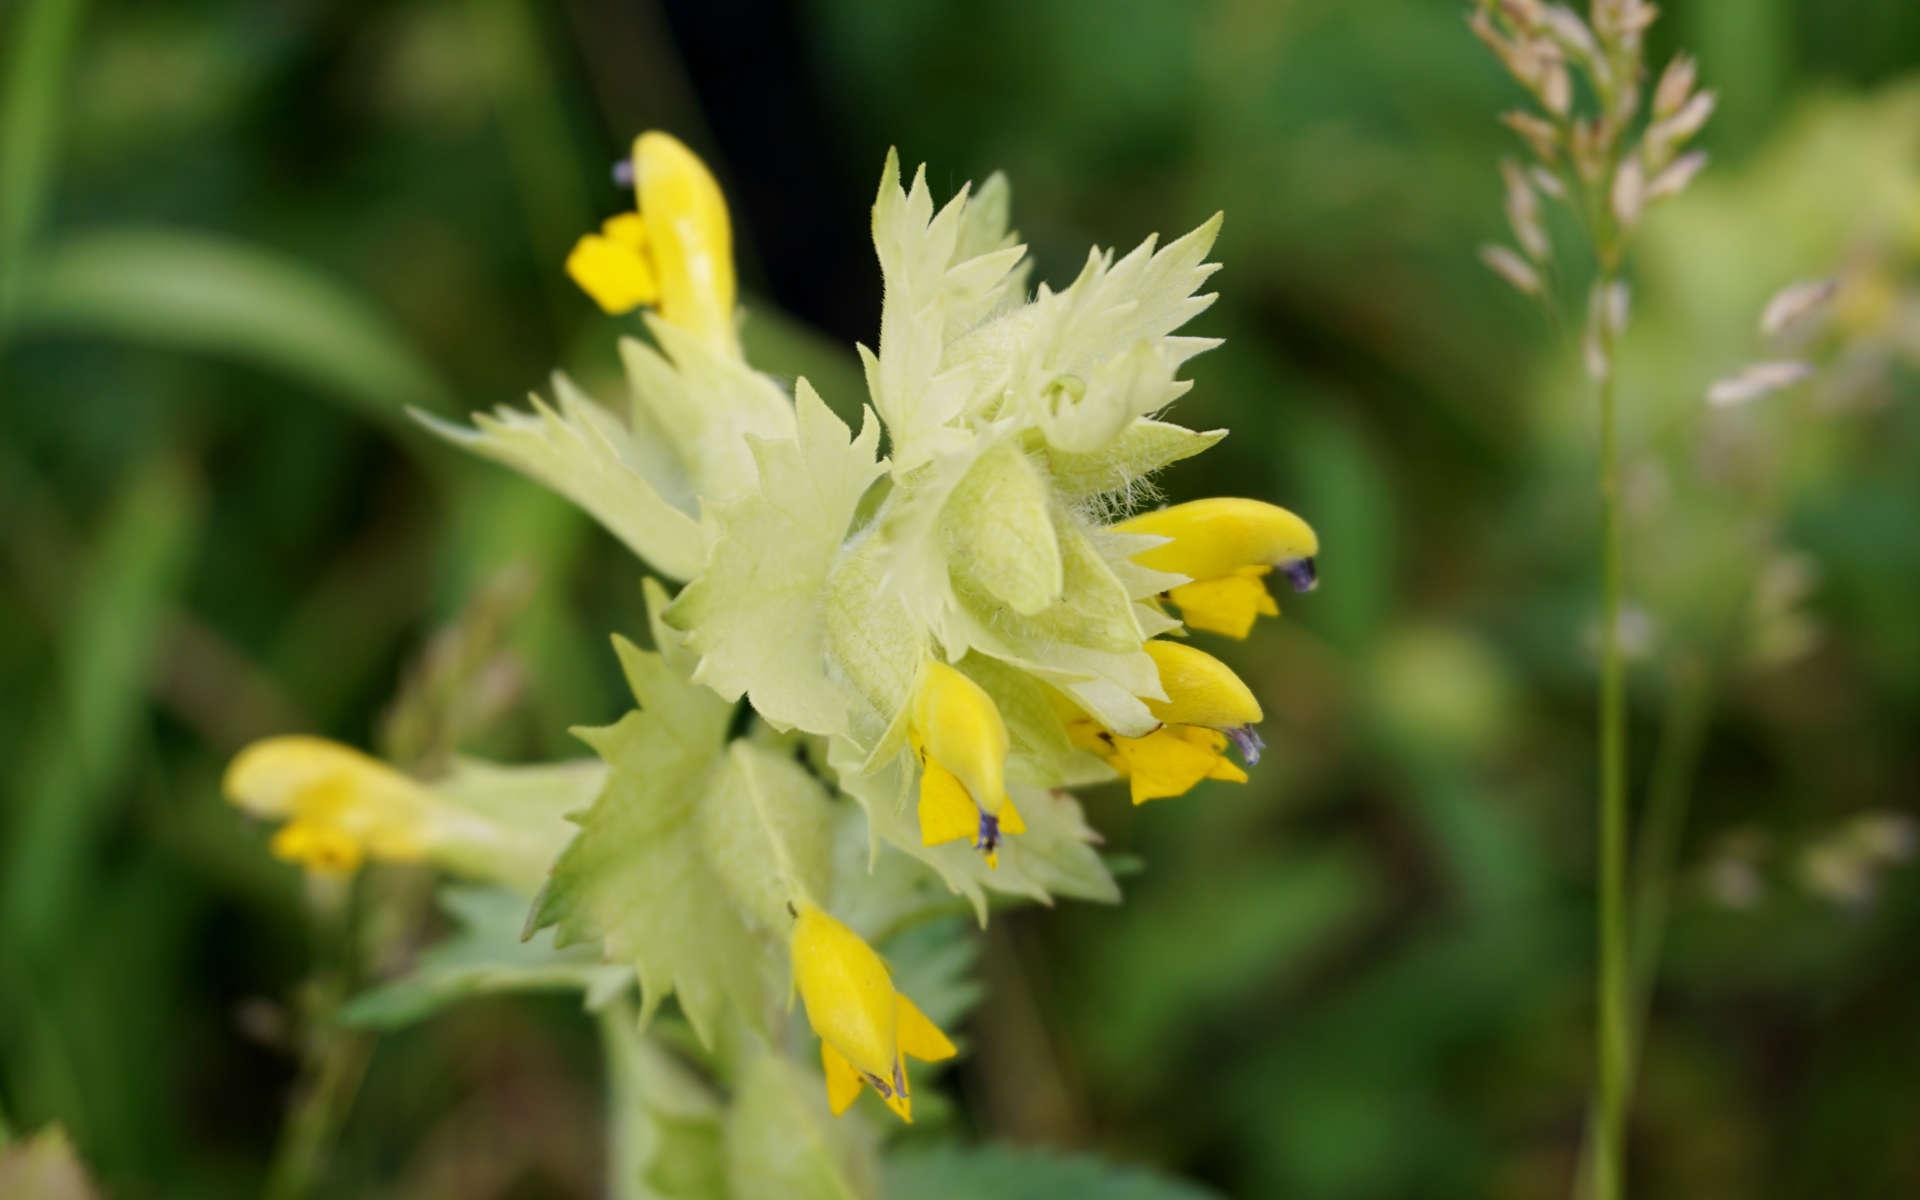 Rhinanthe velu (Crédits: silberbeeren - Flickr)